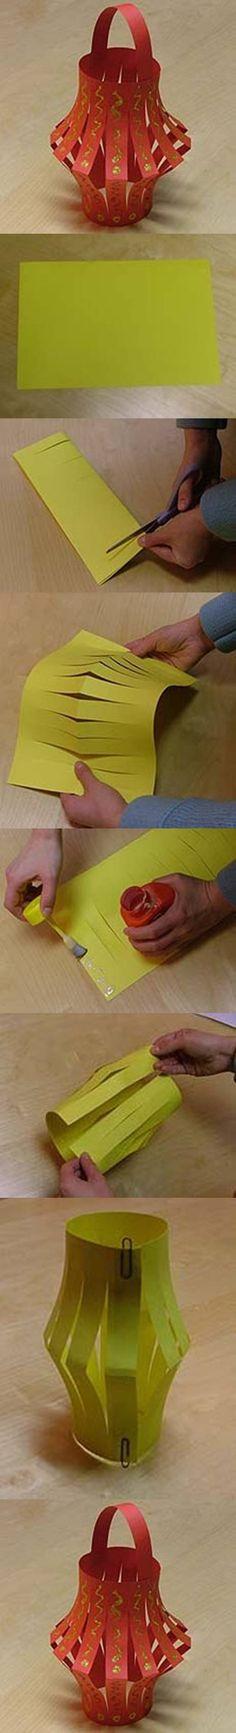 DIY Paper Lantern DIY Projects | UsefulDIY.com Follow Us on Facebook ==> http://www.facebook.com/UsefulDiy